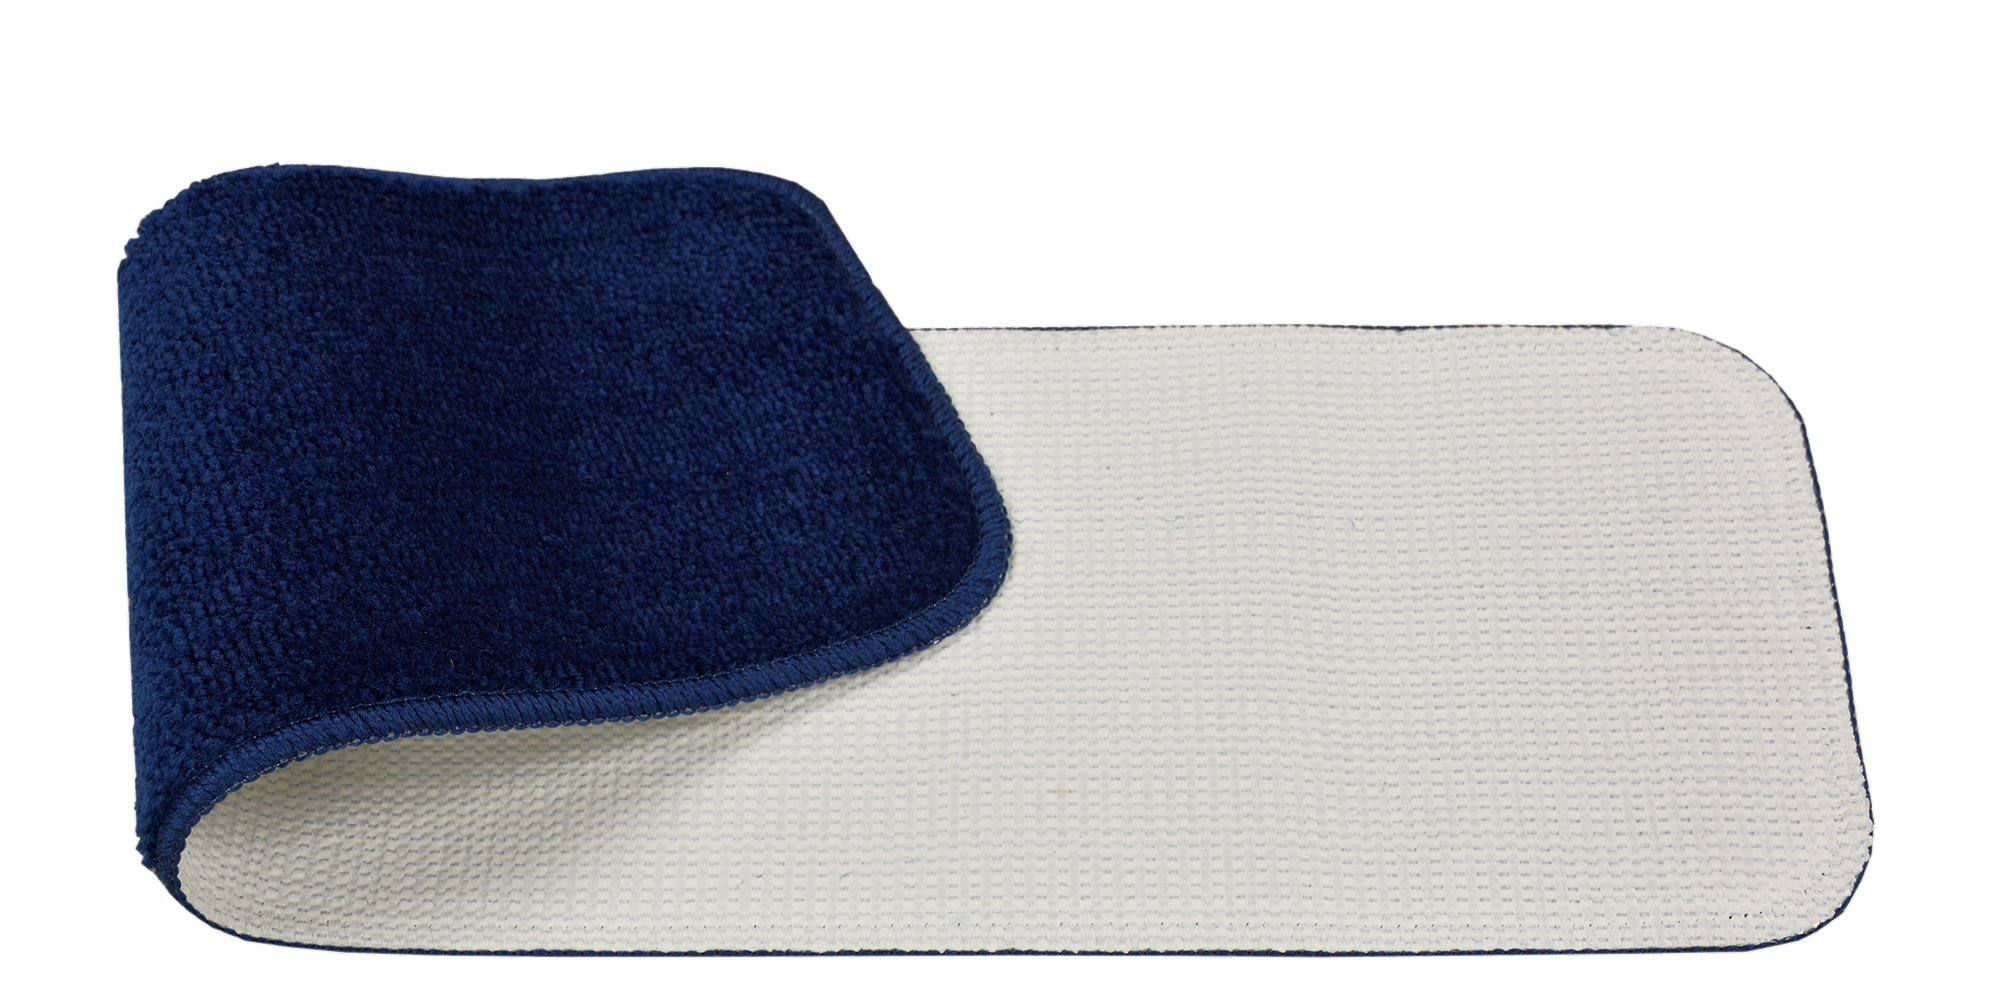 RugStylesOnline TRENDY-ST-8X30-NAVY-13 Trendy Stair Tread Treads Indoor Skid Slip Resistant Carpet Stair Tread Treads Machine Washable 8 ½'' W x 30'' L, Royal Navy Blue, Set of 13 by RugStylesOnline (Image #3)